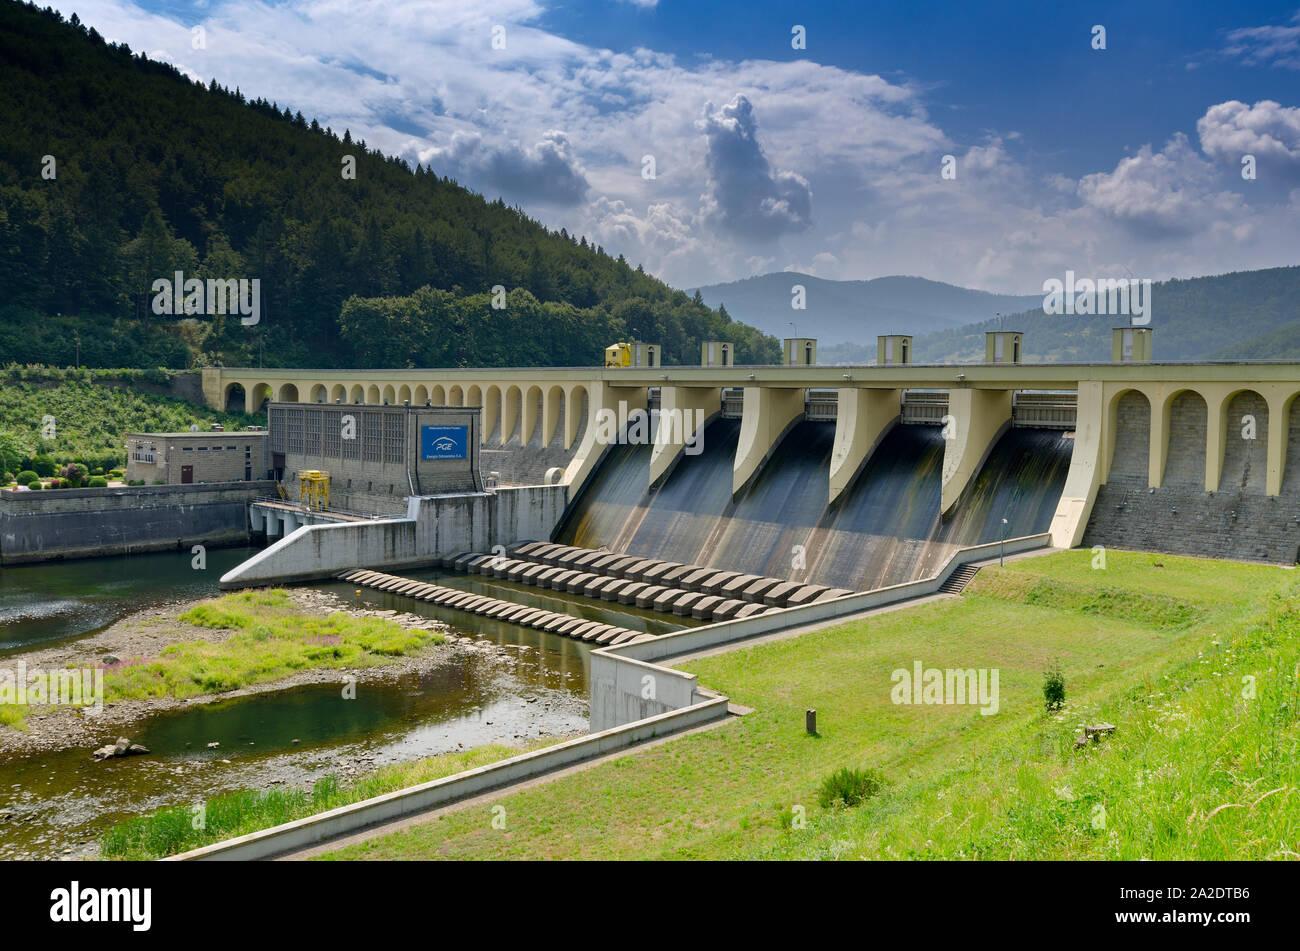 Miedzybrodzie Bialskie, Silesian province, Poland. Porabka dam and hydroelectric power station on Sola river. Beskid Maly mountains. Stock Photo